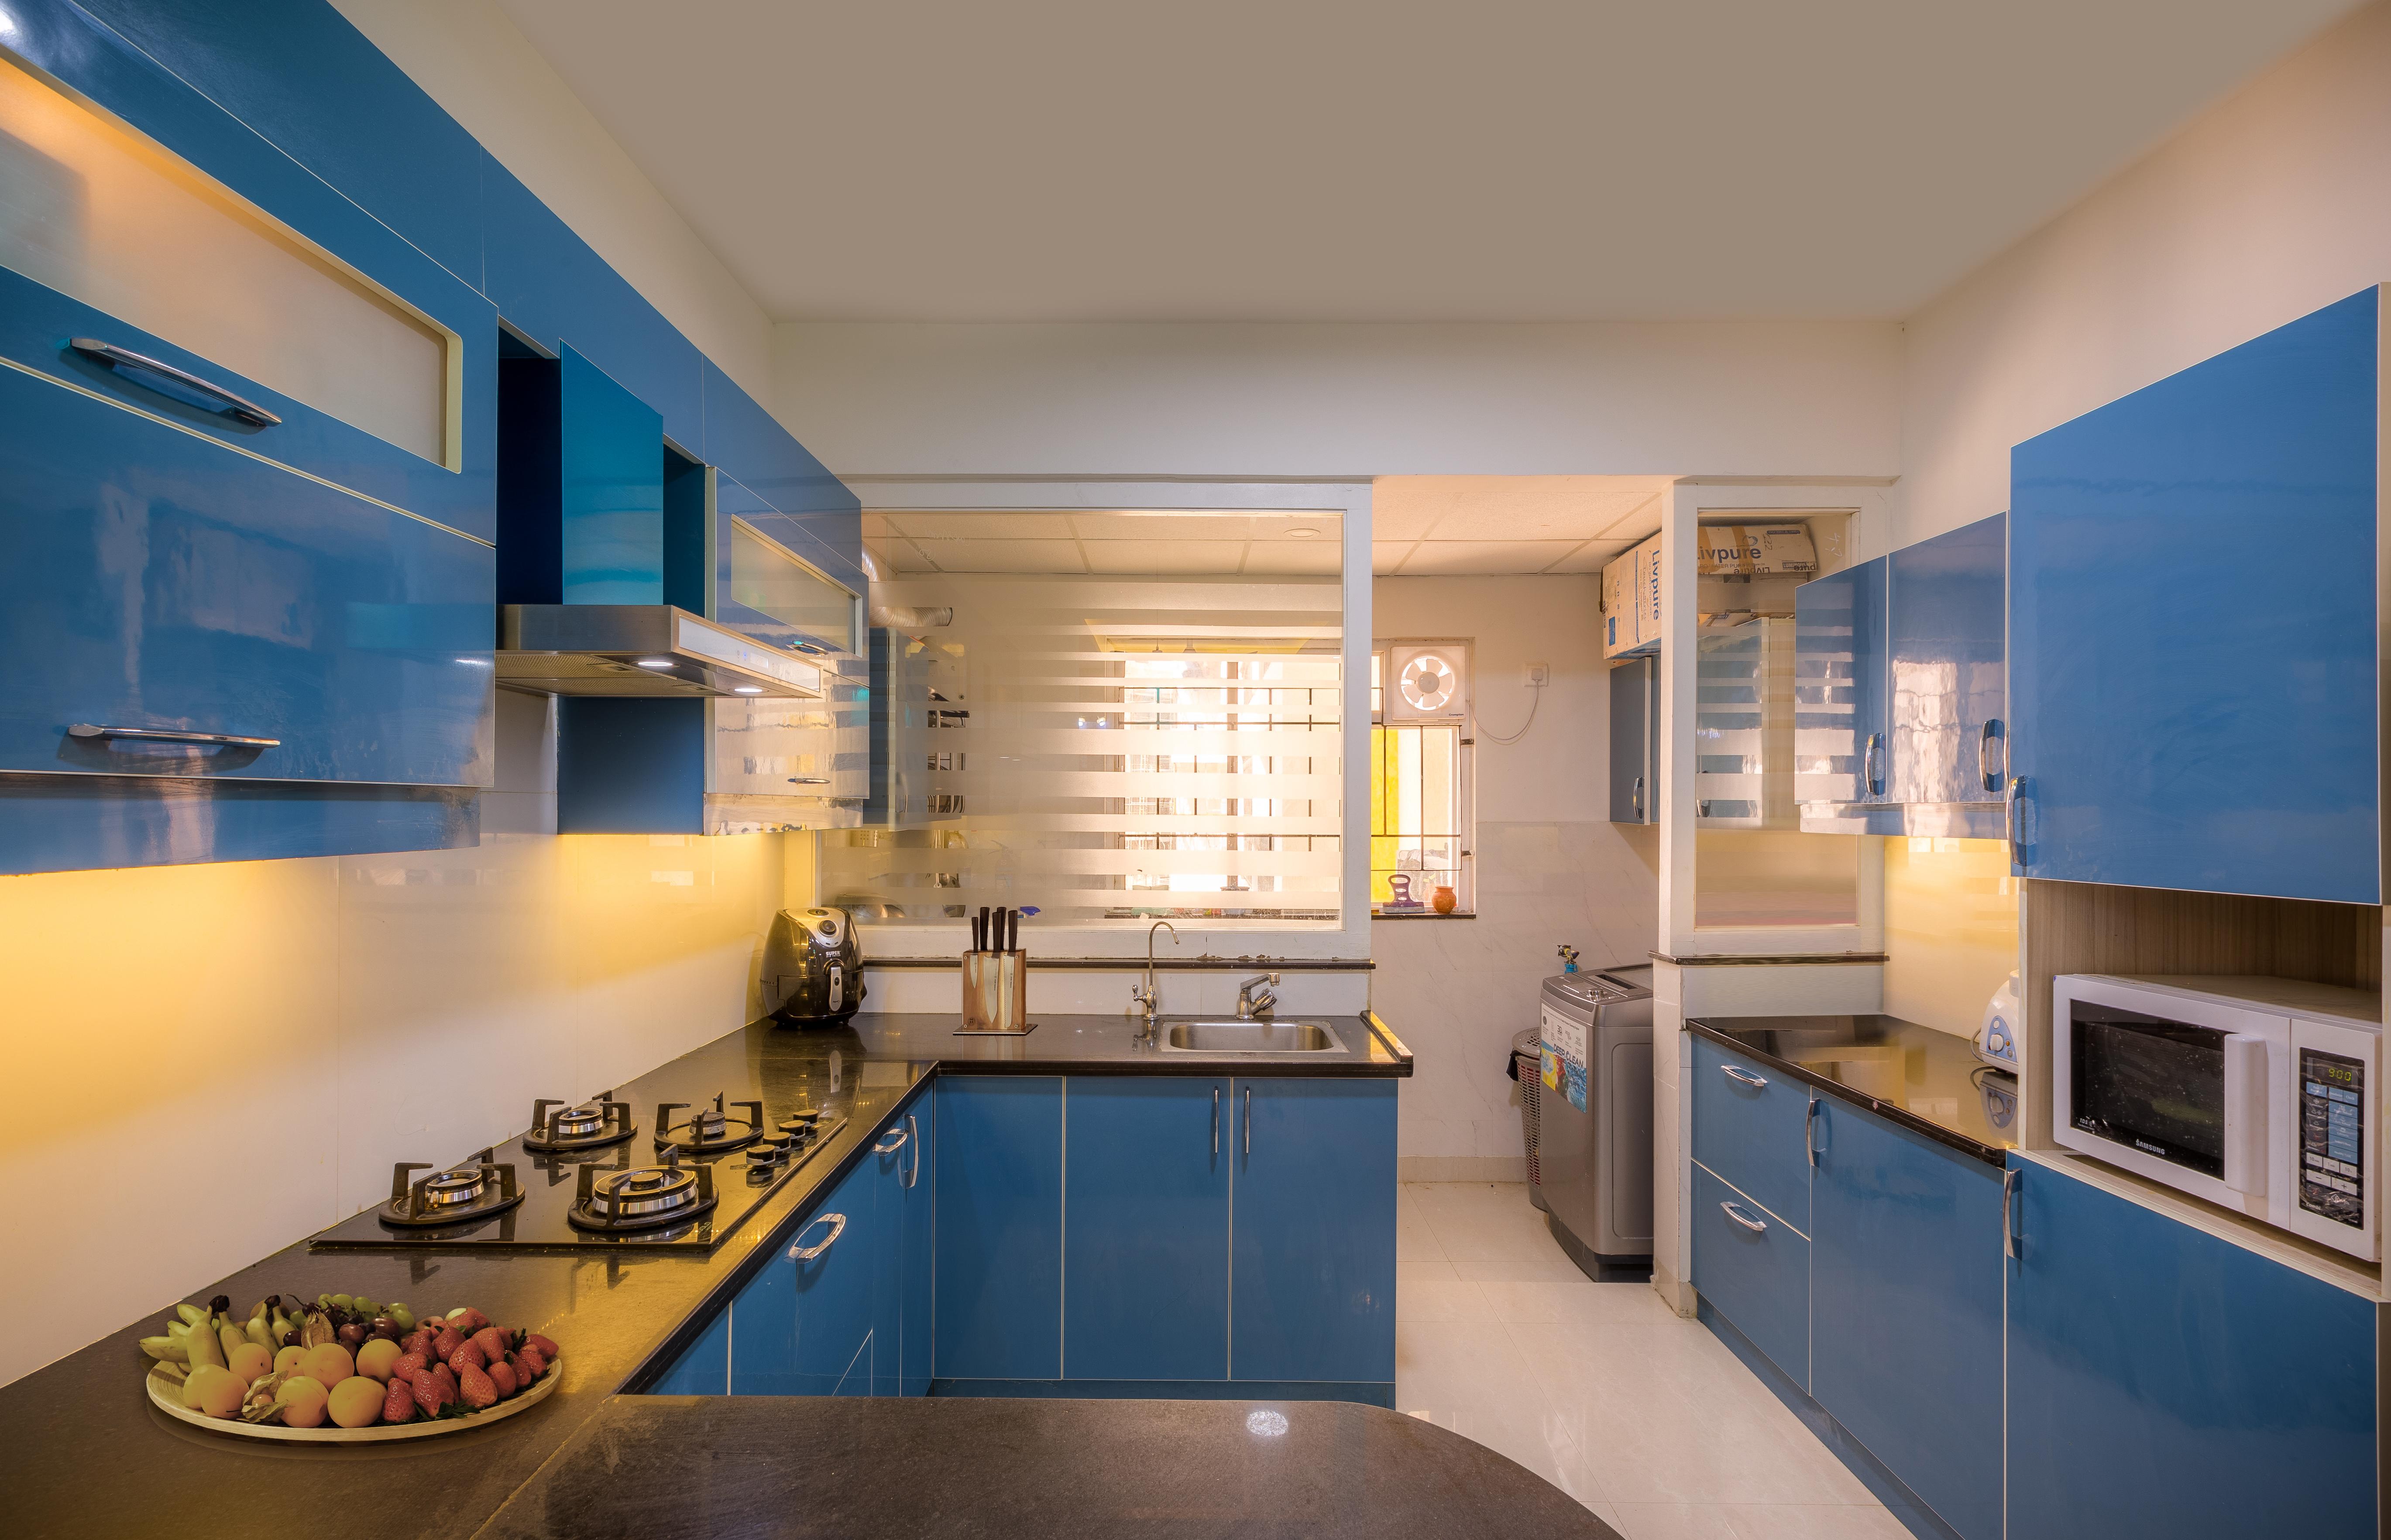 2BHK Interior Design Electronic City, Bangalore   Decorpot ...